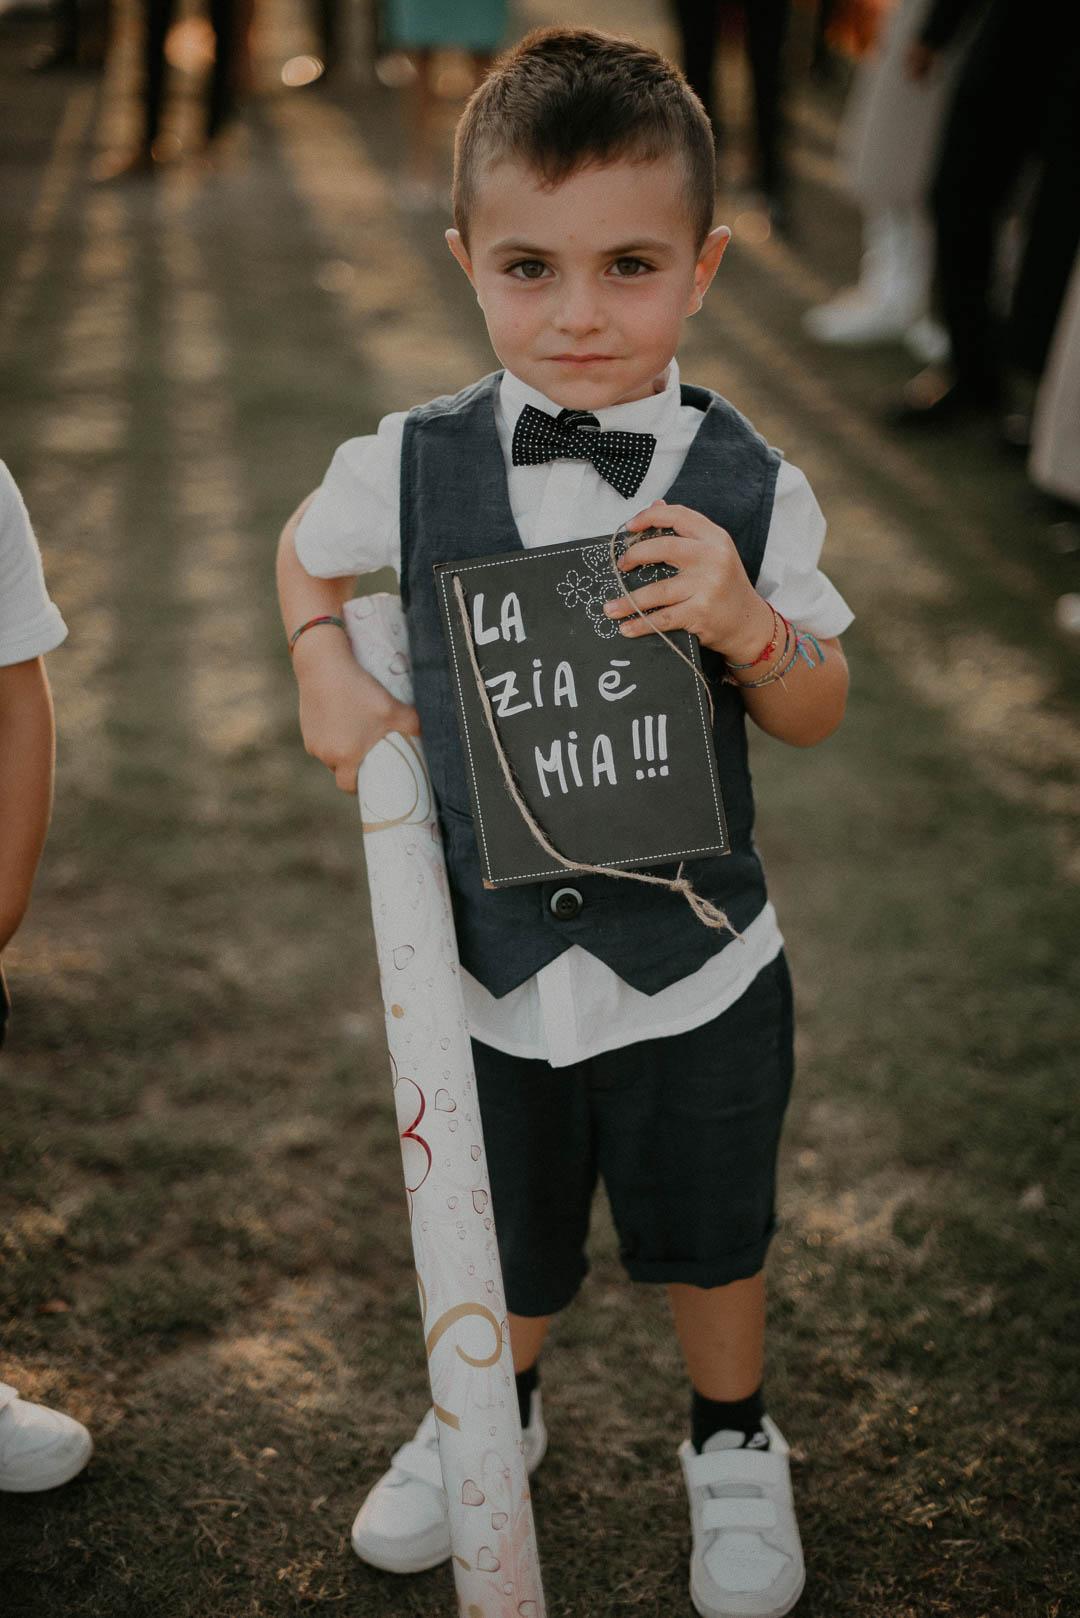 wedding-photographer-destination-fineart-bespoke-reportage-napoli-nabilah-vivianeizzo-spazio46-103